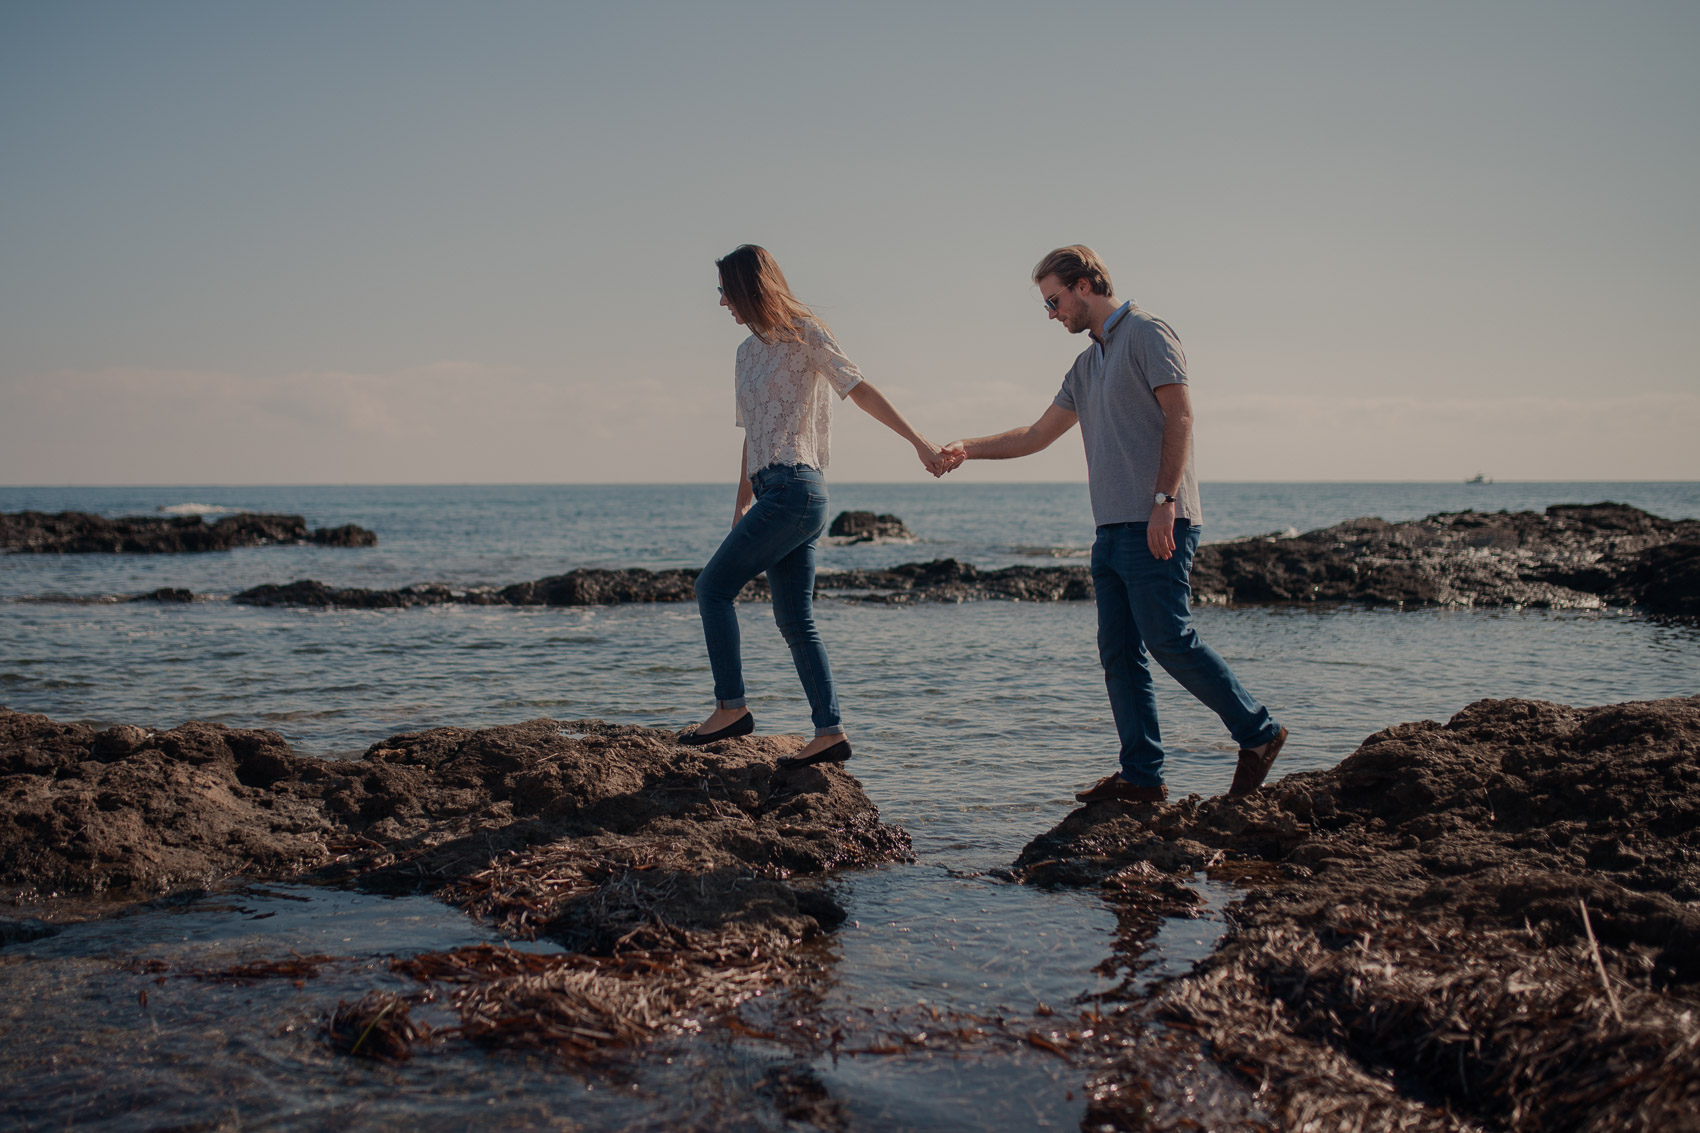 pareja recien casados playa mar menor agua manos gafas beach